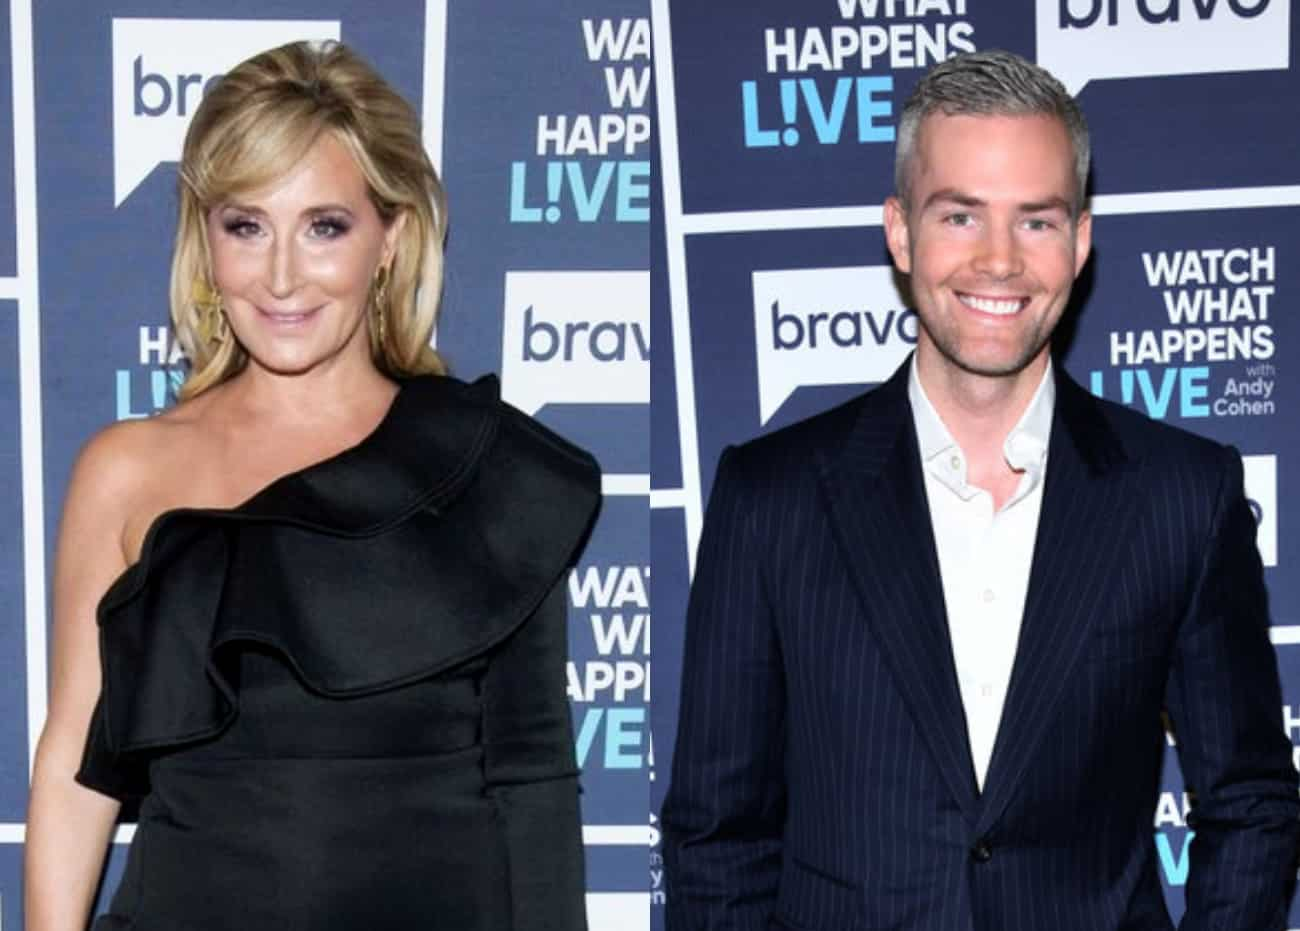 RHONY's Sonja Morgan Shares Details Of Her Shocking Short-Lived Romance With MDLNY Star Ryan Serhant